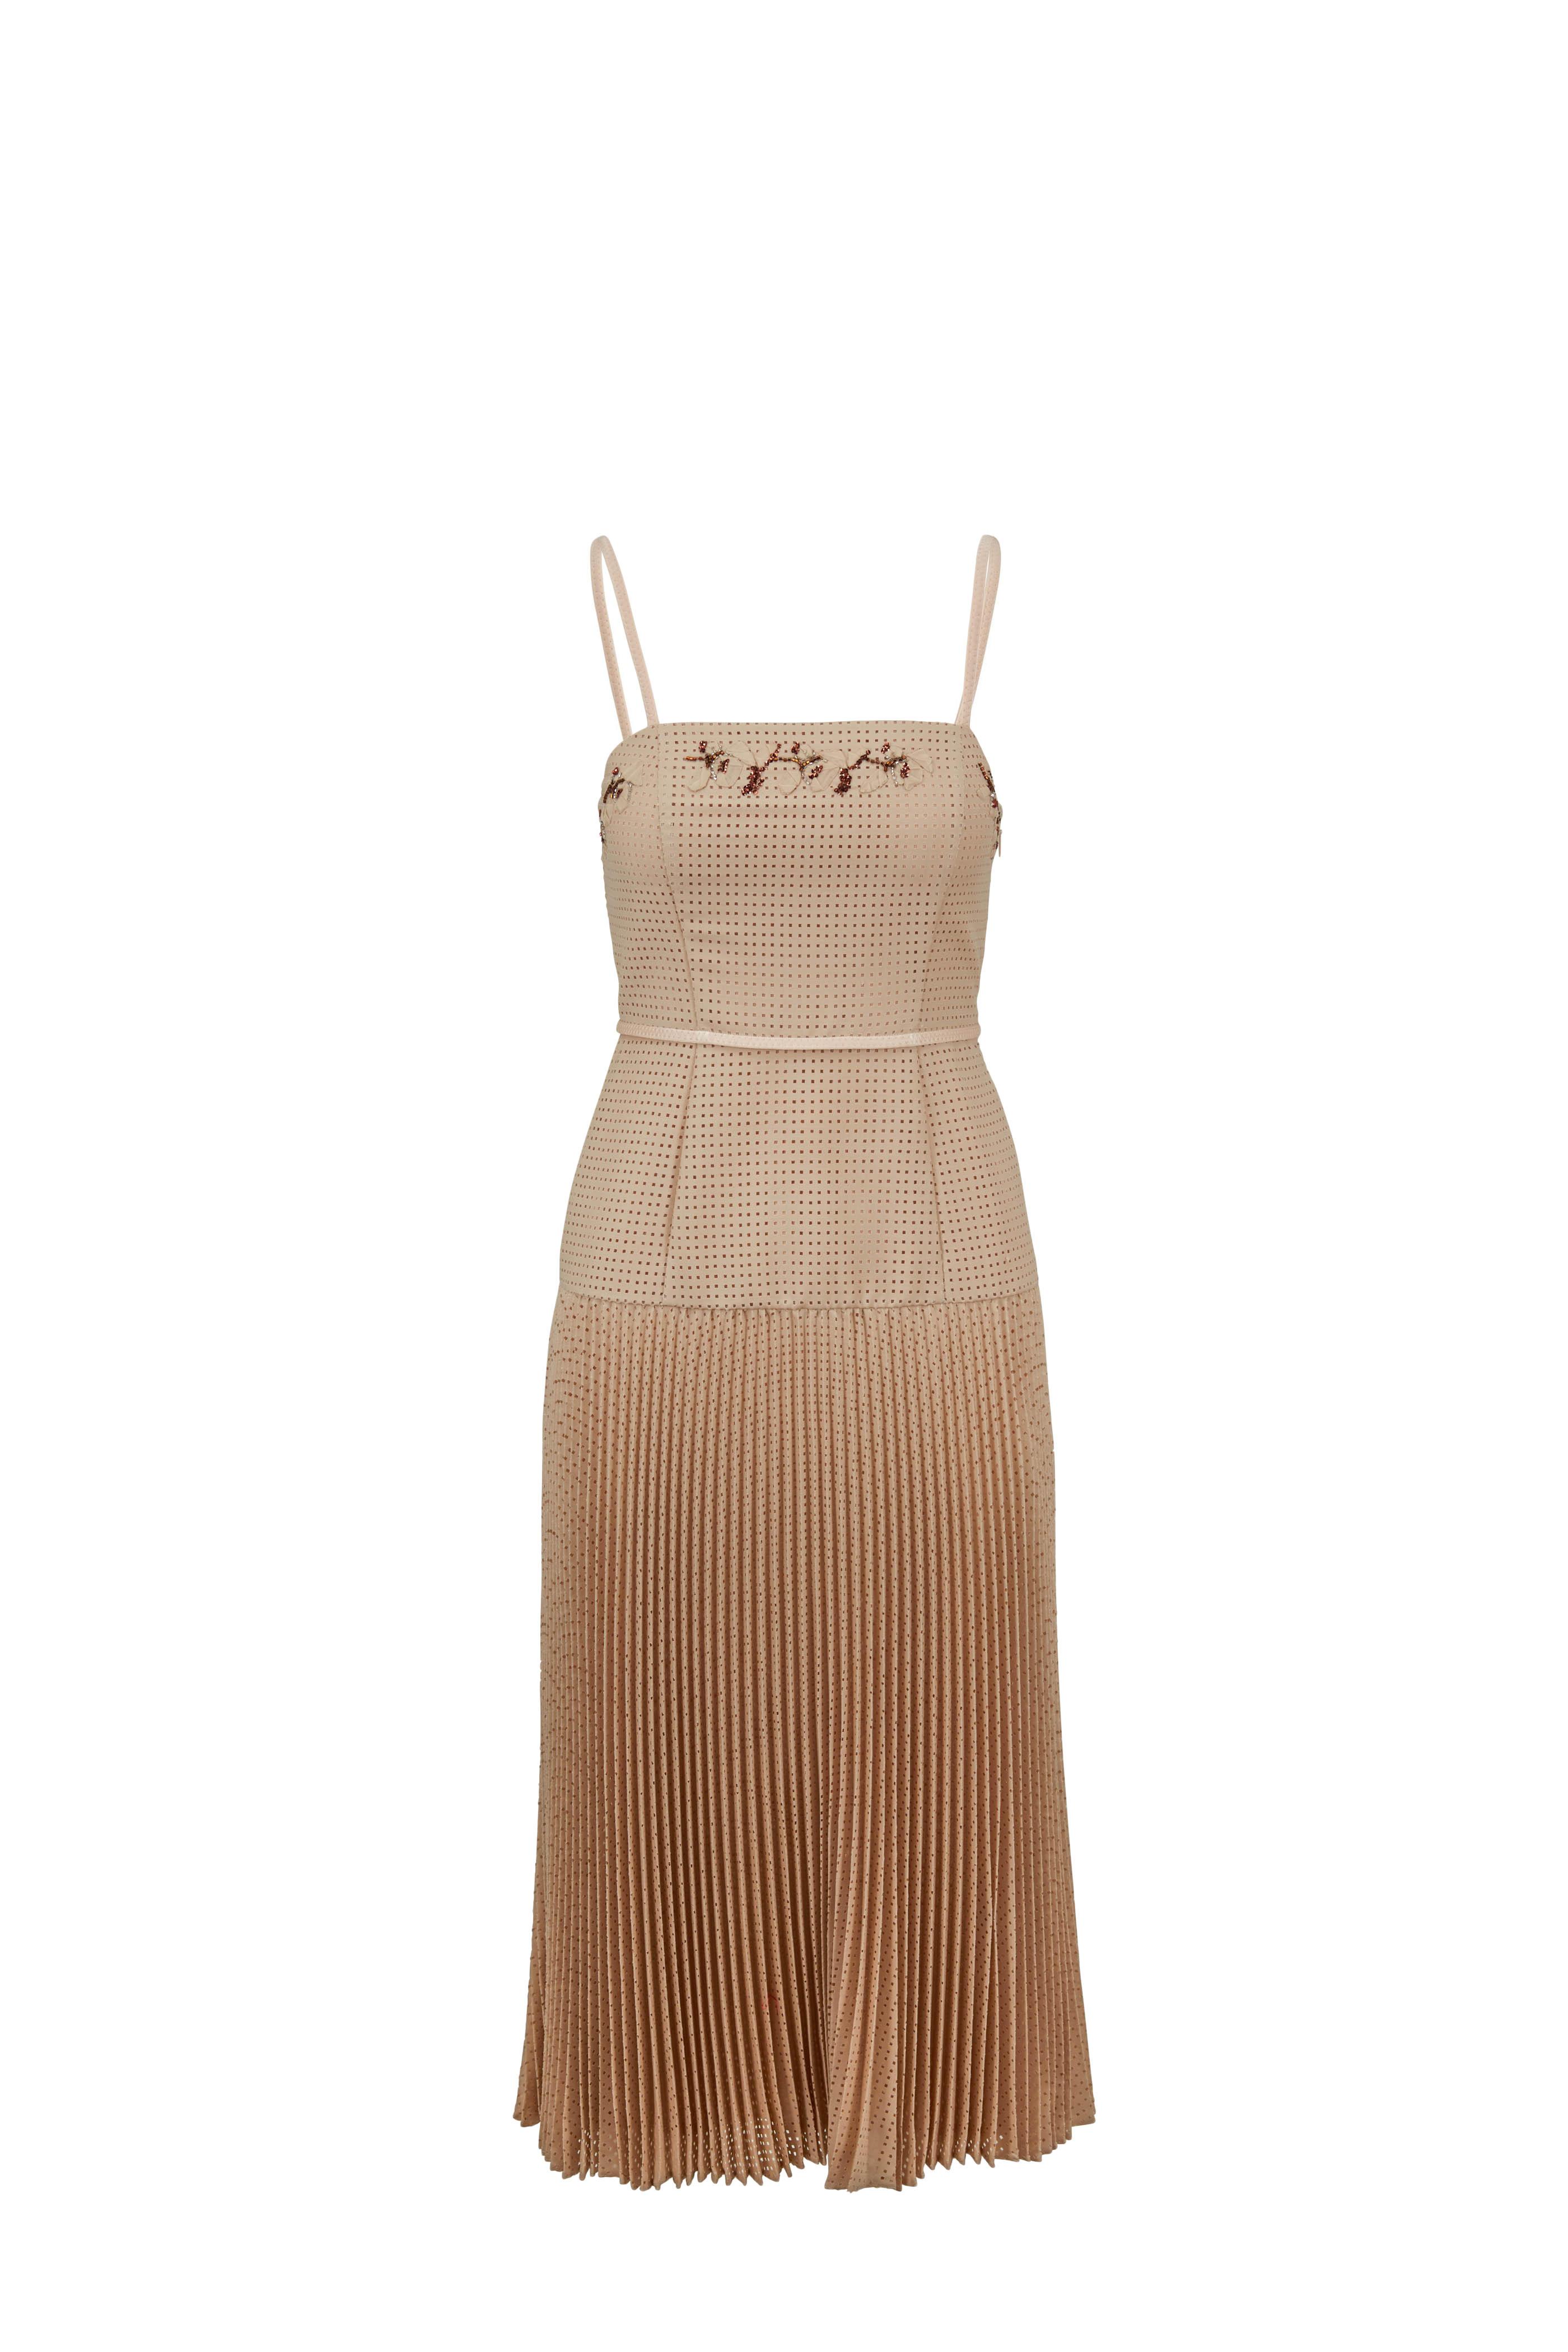 4795b6f1a3aa Fendi - Beige Micro-Mesh Mohair Sleeveless Dress